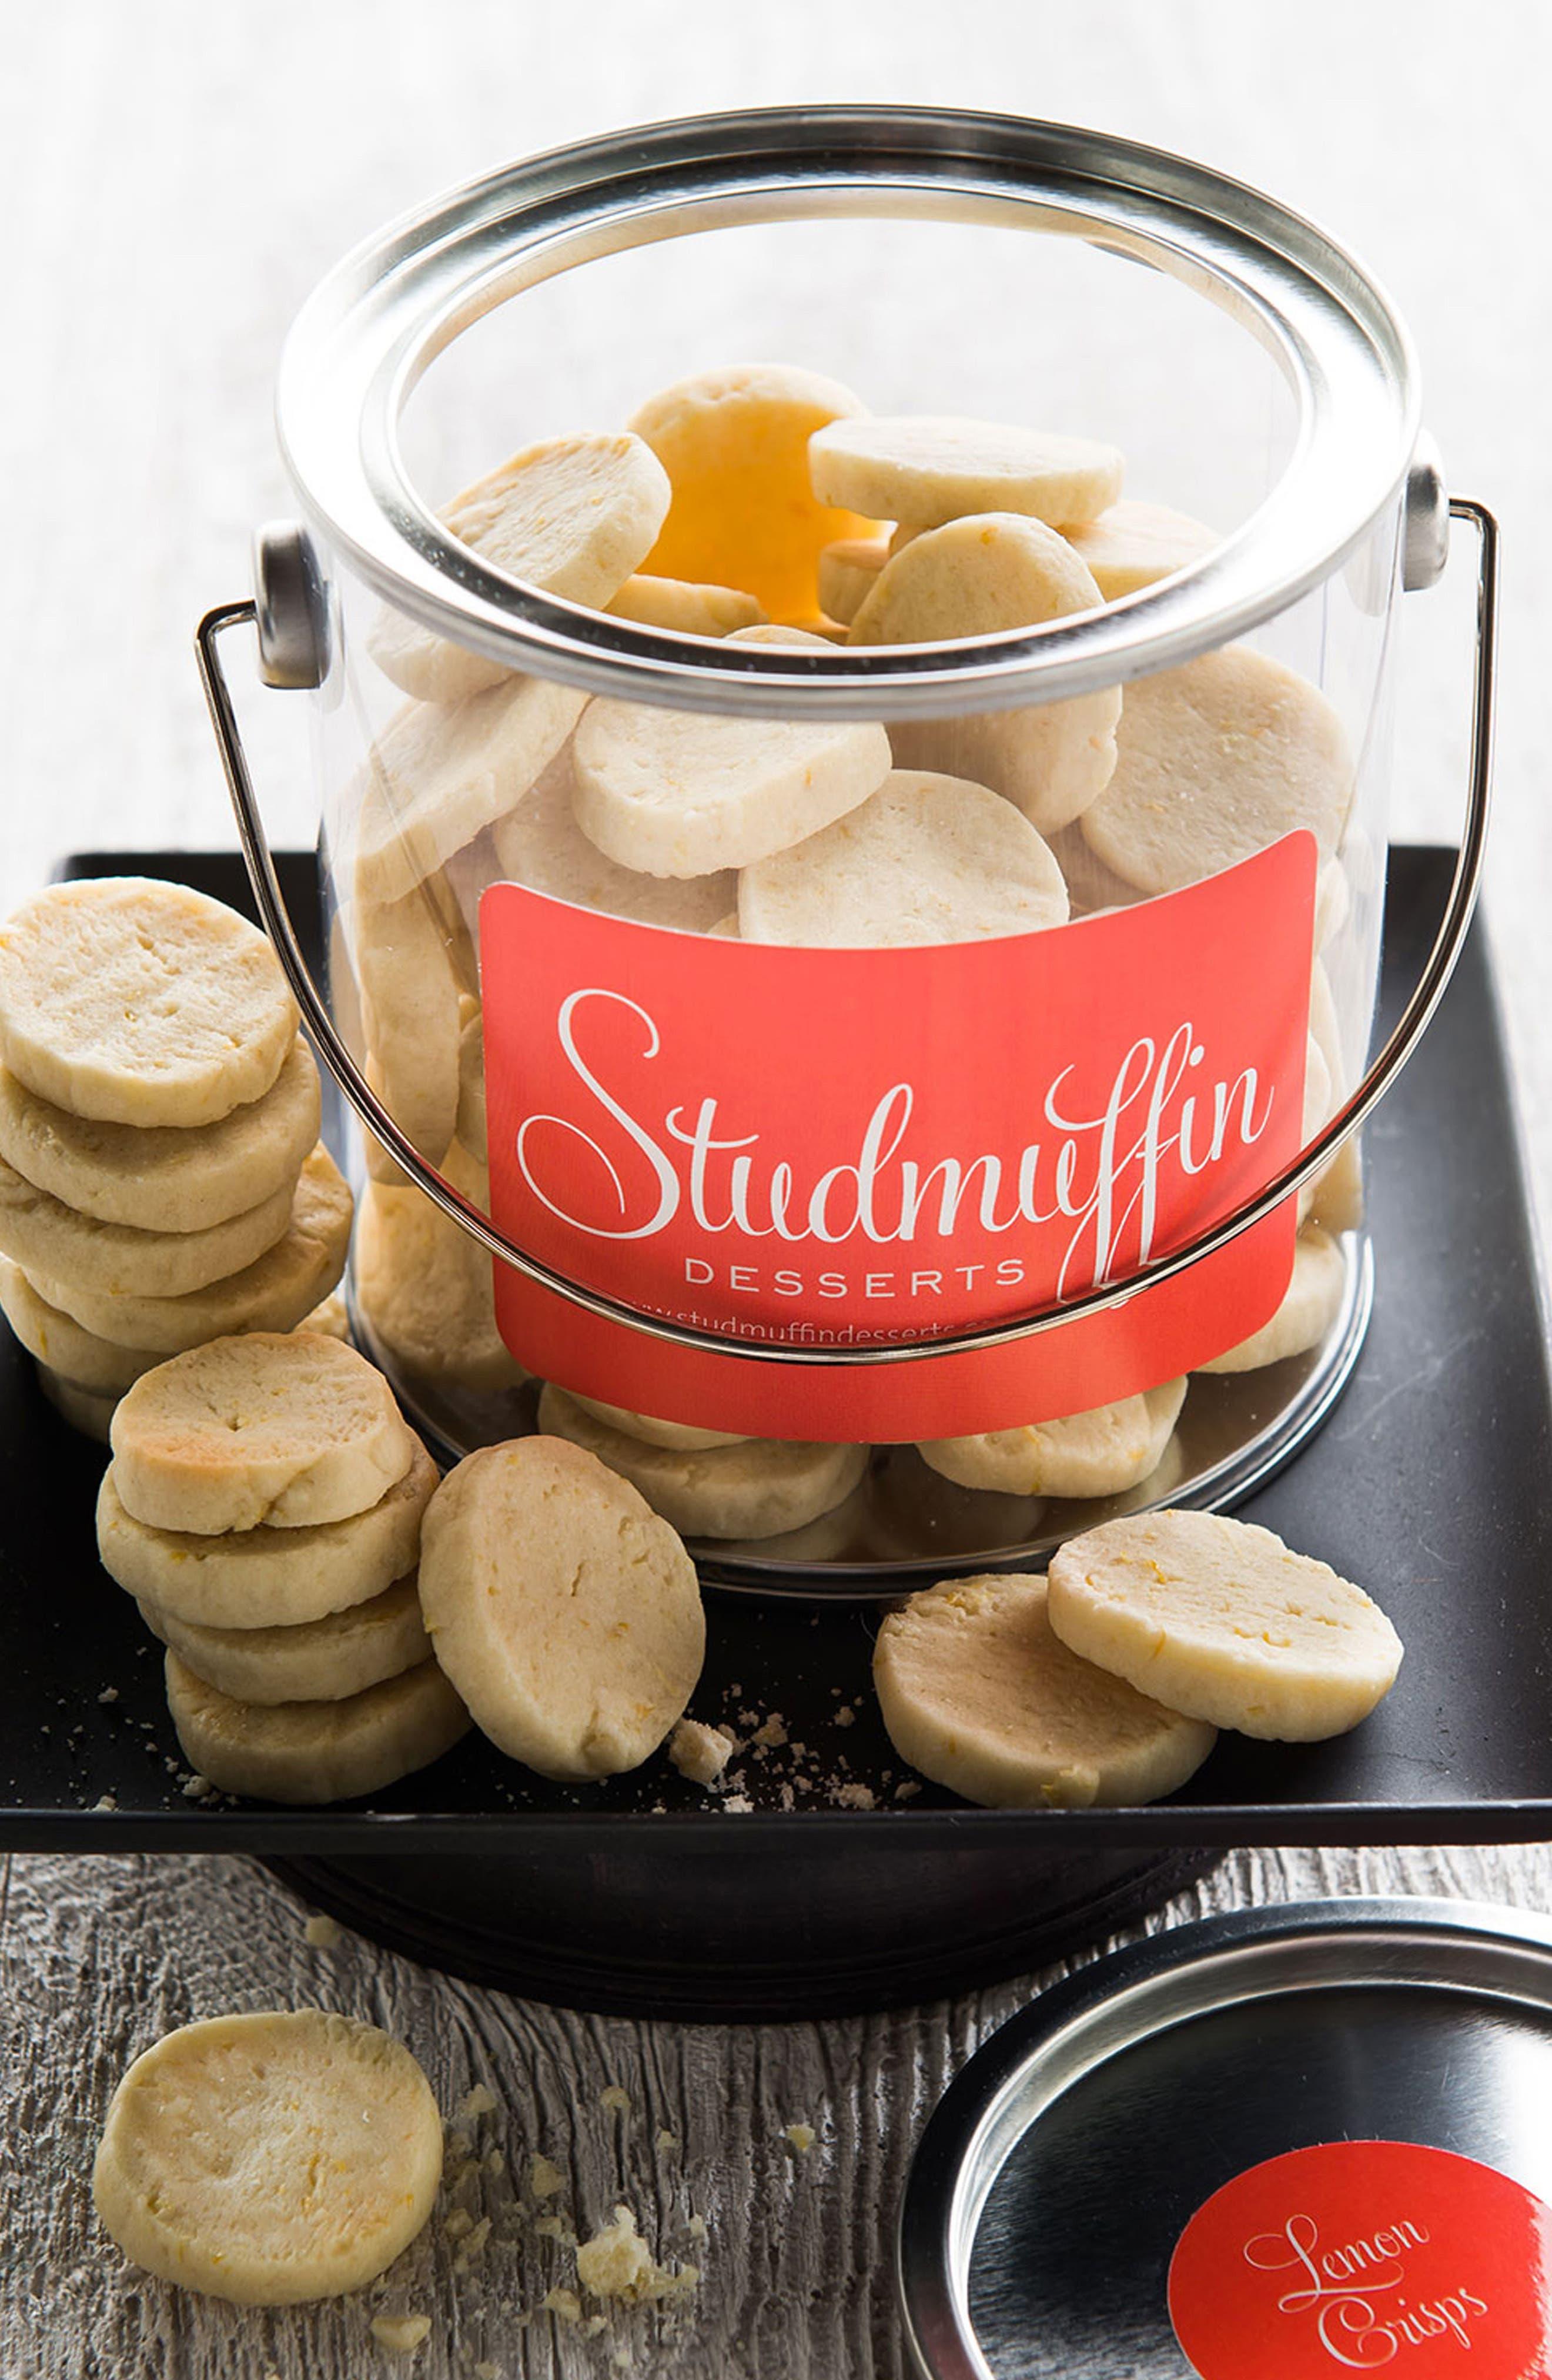 Stud Buckets Lemon Crisps Cookie Bites